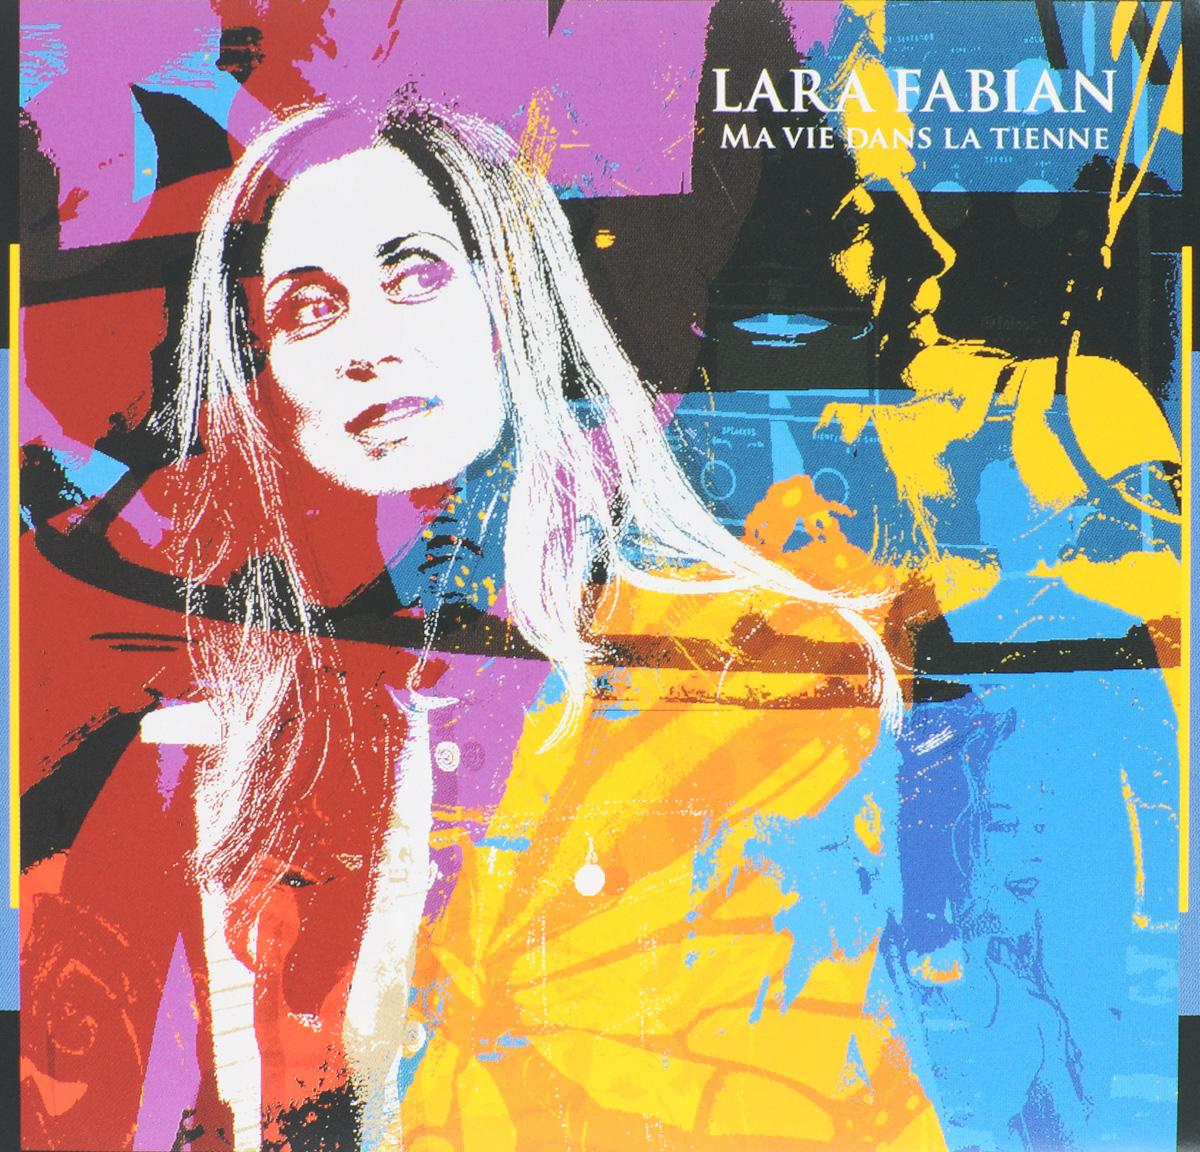 Лара Фабиан Lara Fabian. Ma Vie Dans La Tienne. Edition Limitee (CD + DVD) cd lara fabian ma vie dans la tienne